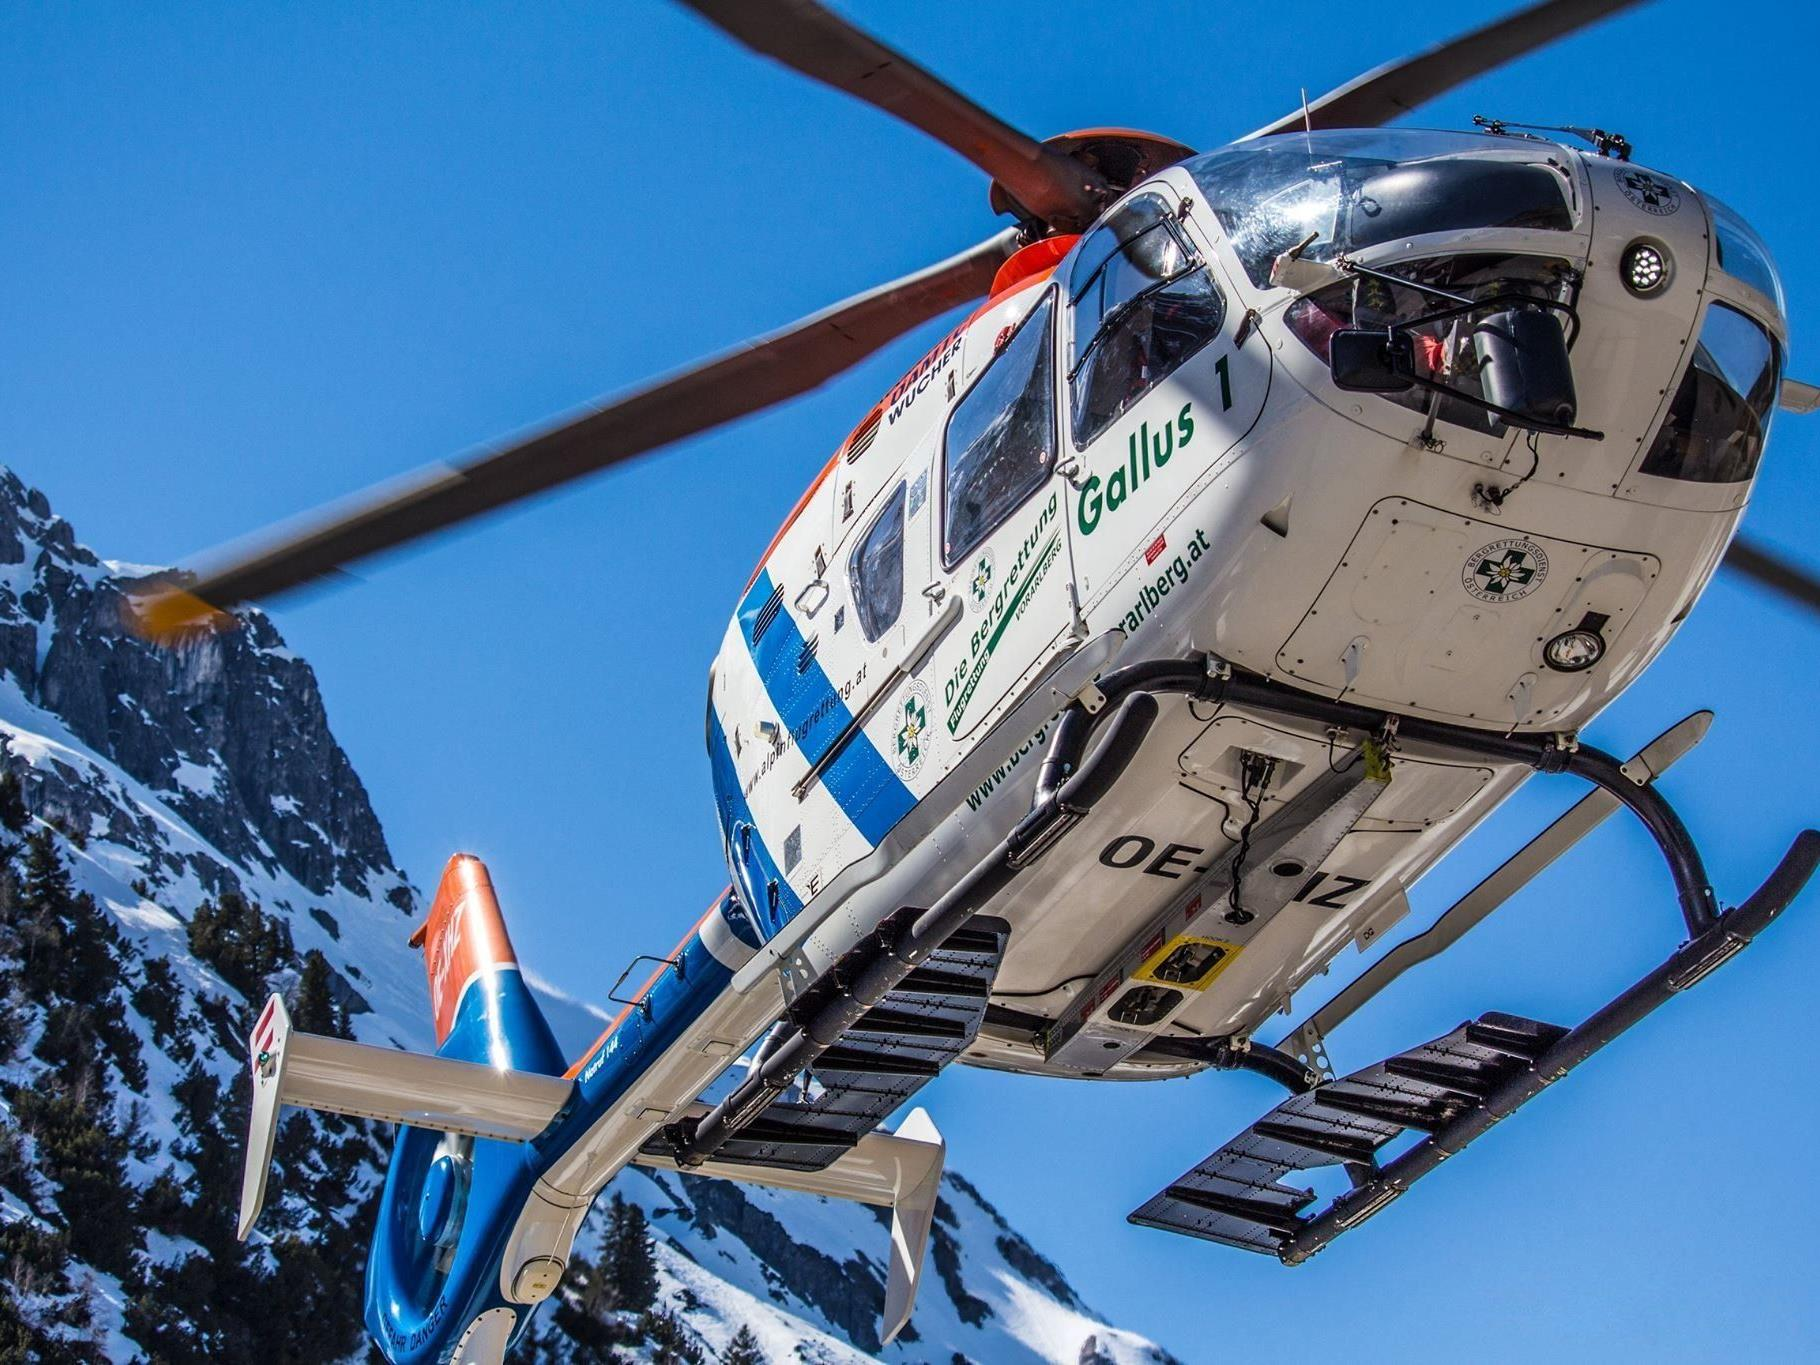 In Lech kam es am Mittwoch zu drei Unfällen.